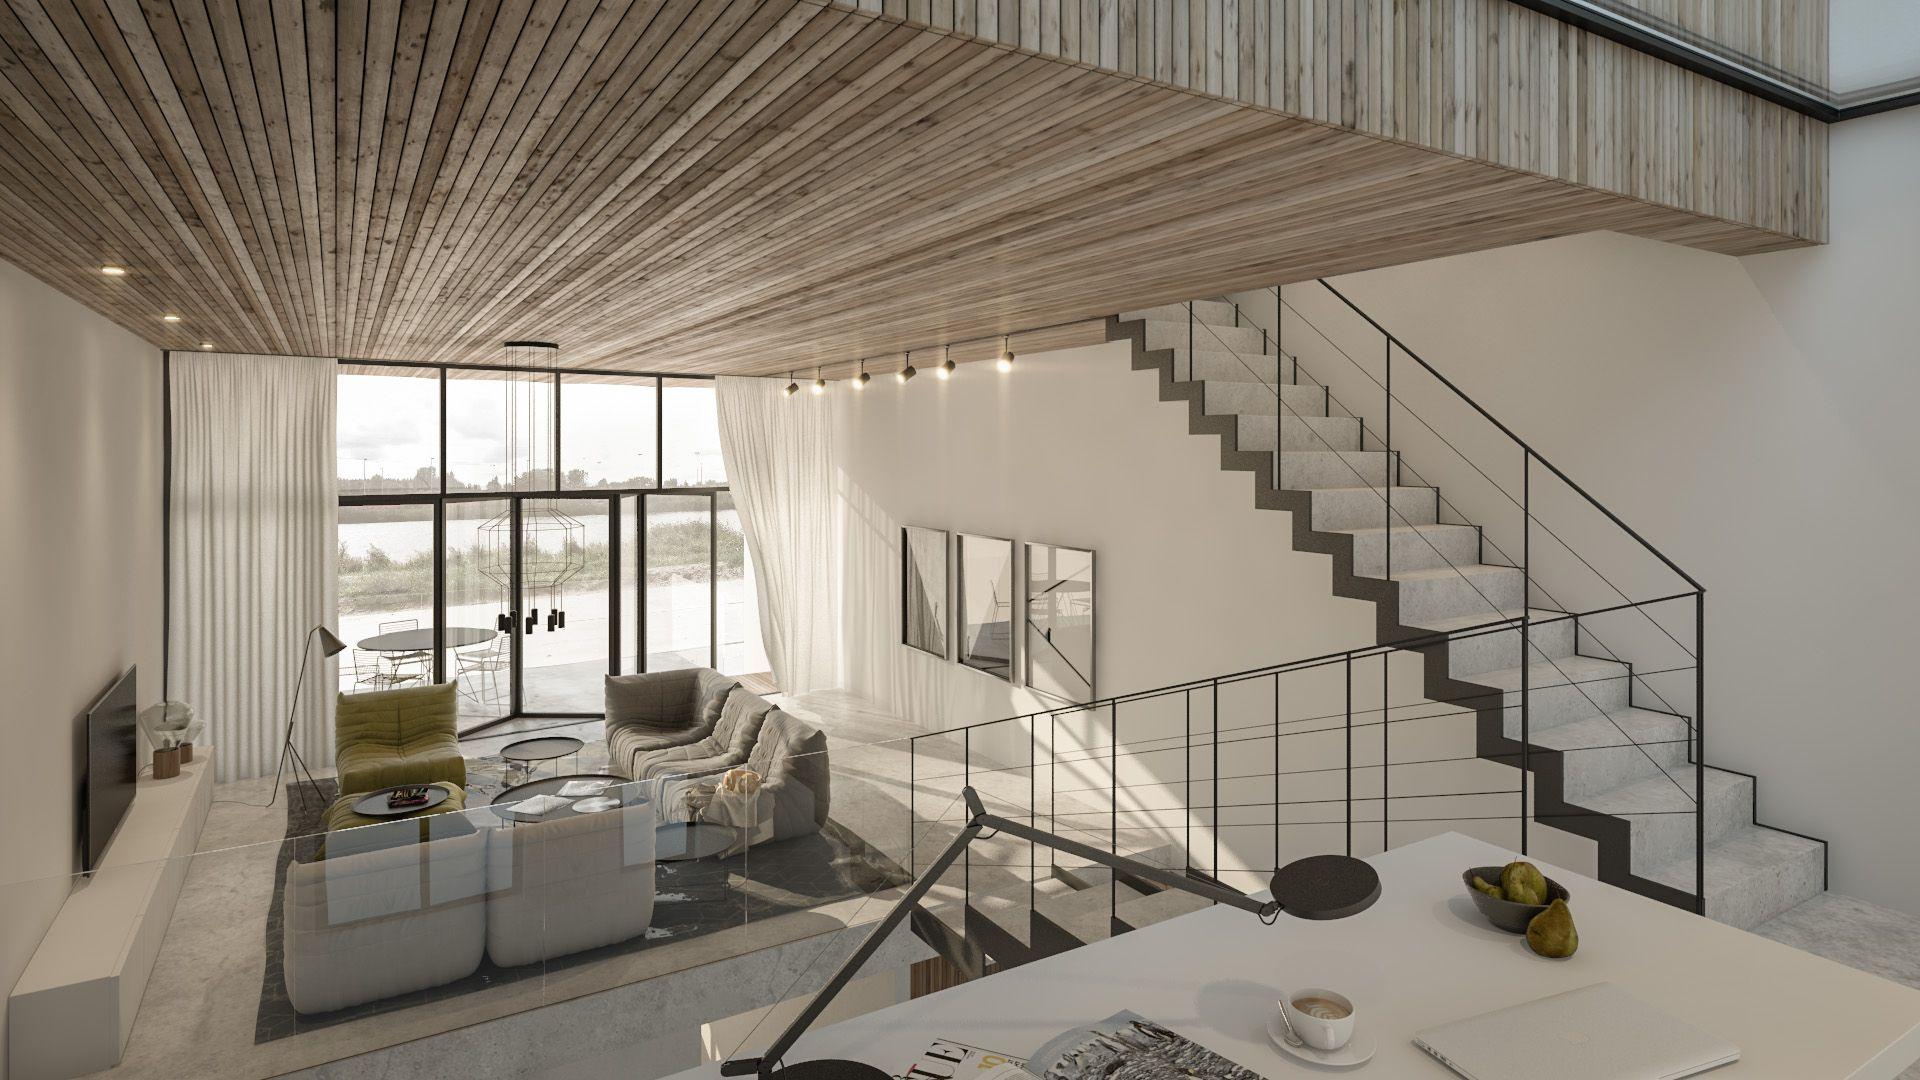 Interieur zelfbouw ijburg bnla architecten. homes lovely